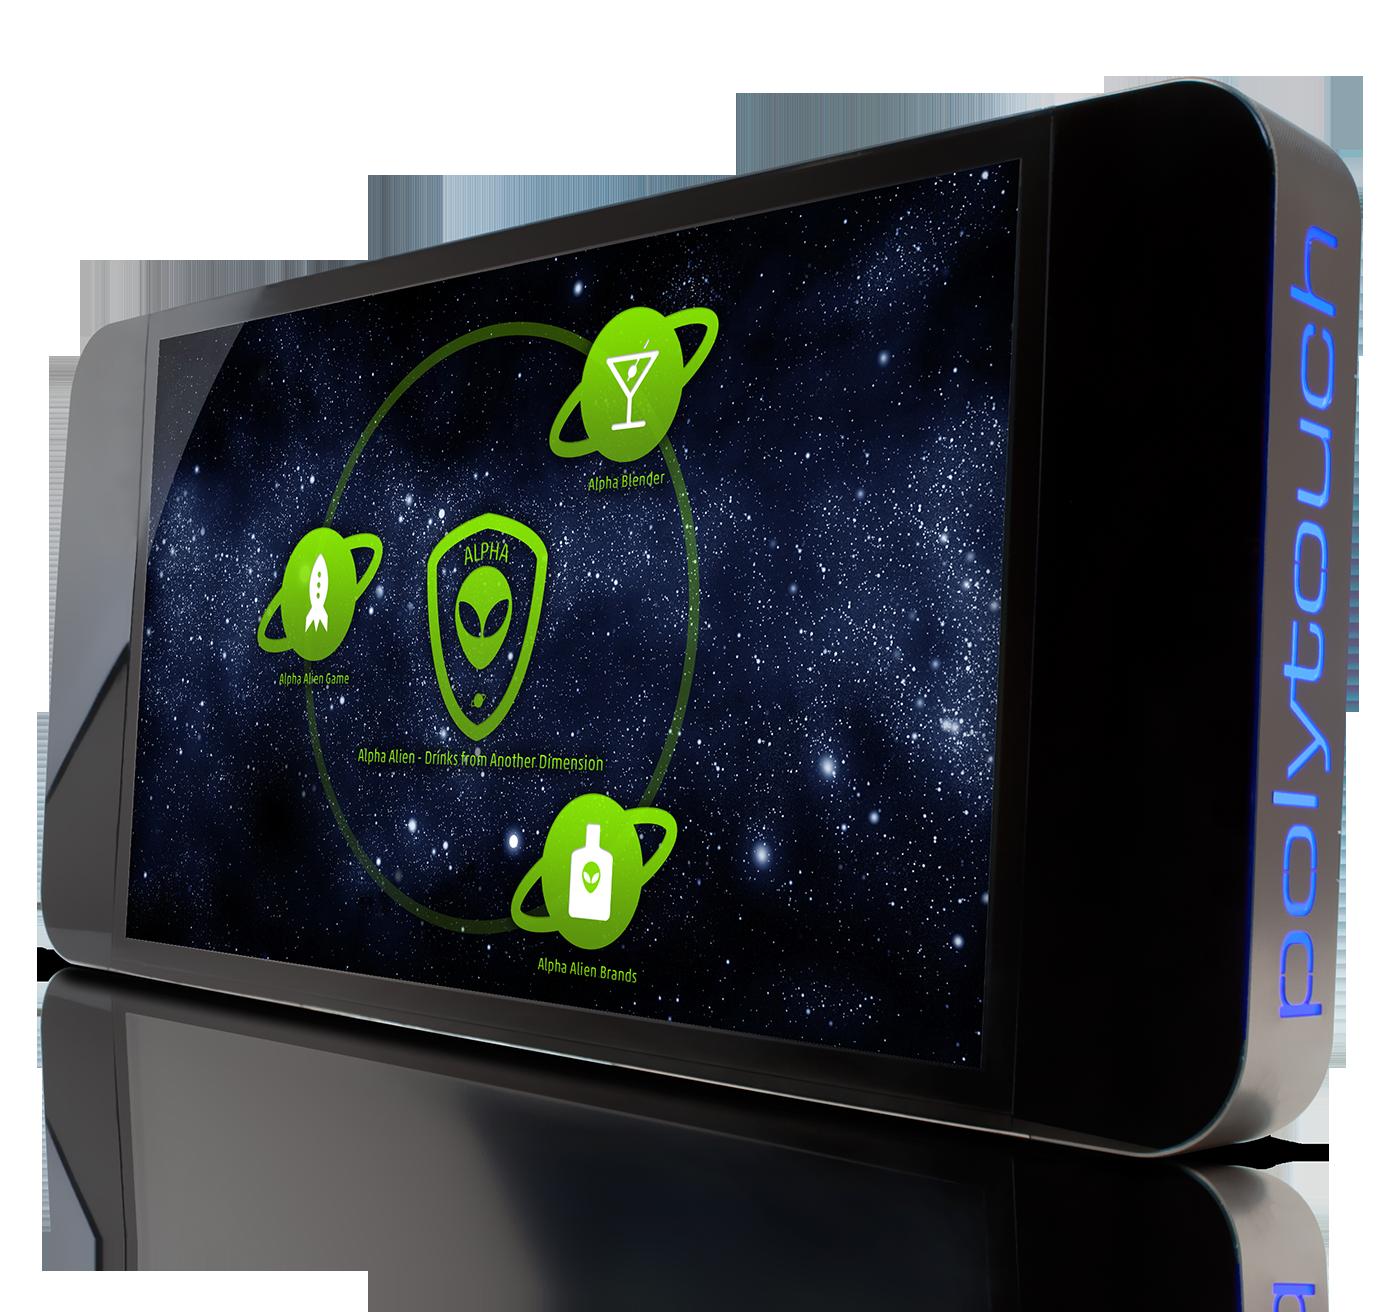 Interface Corporate Karma Spezialisten Fr User Experience Design Avh 3200bt Alpha Alien Drinks On Polytouch